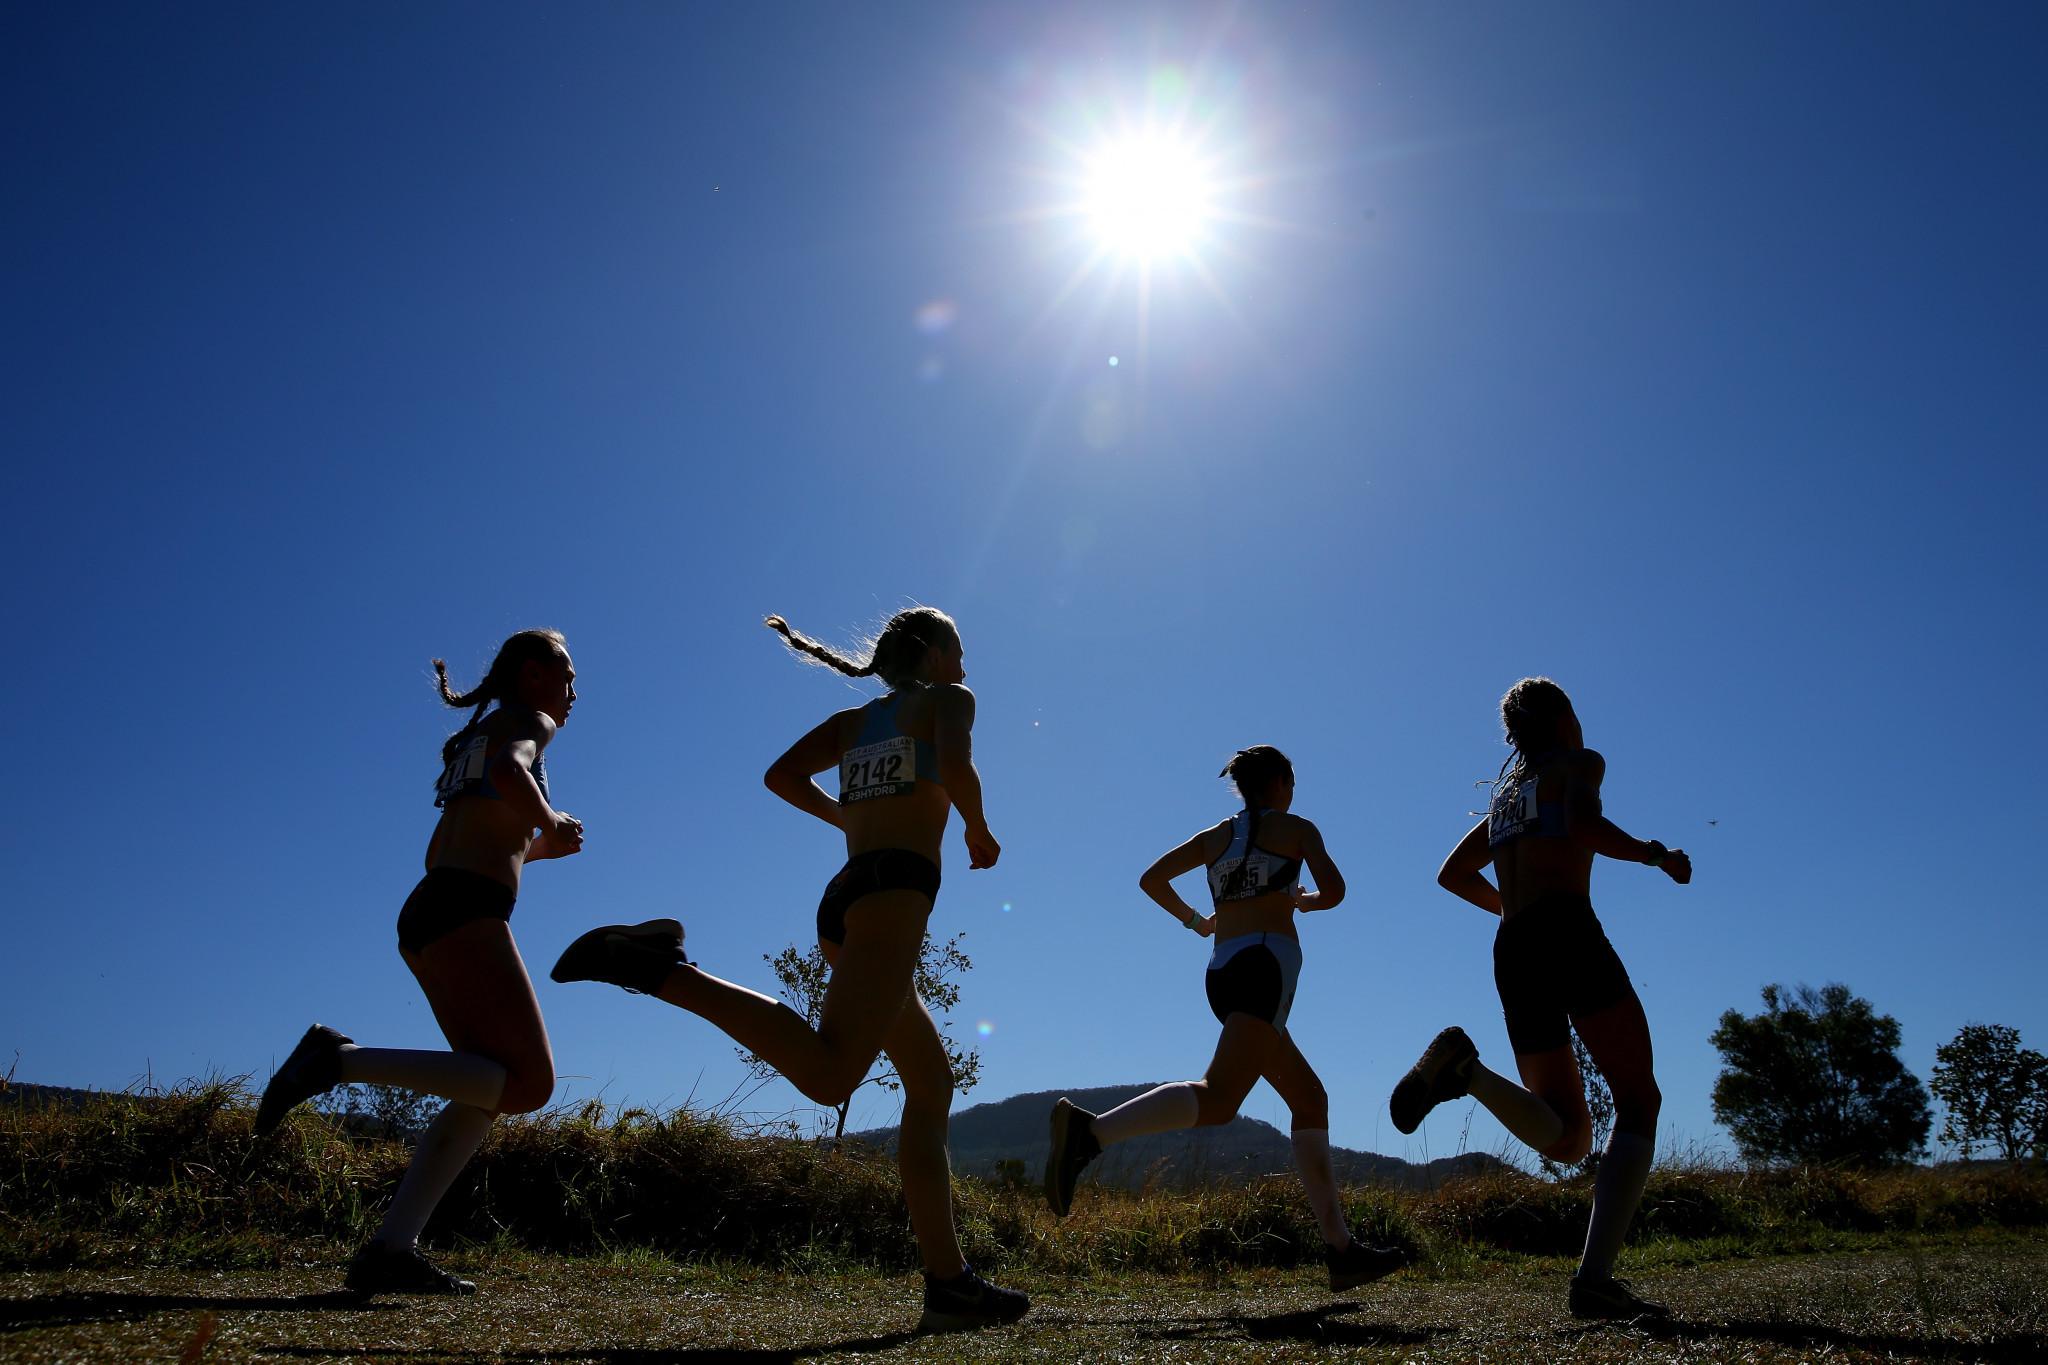 Habte and Niyomukunzi win World Athletics Cross Country Tour races in Amorebieta